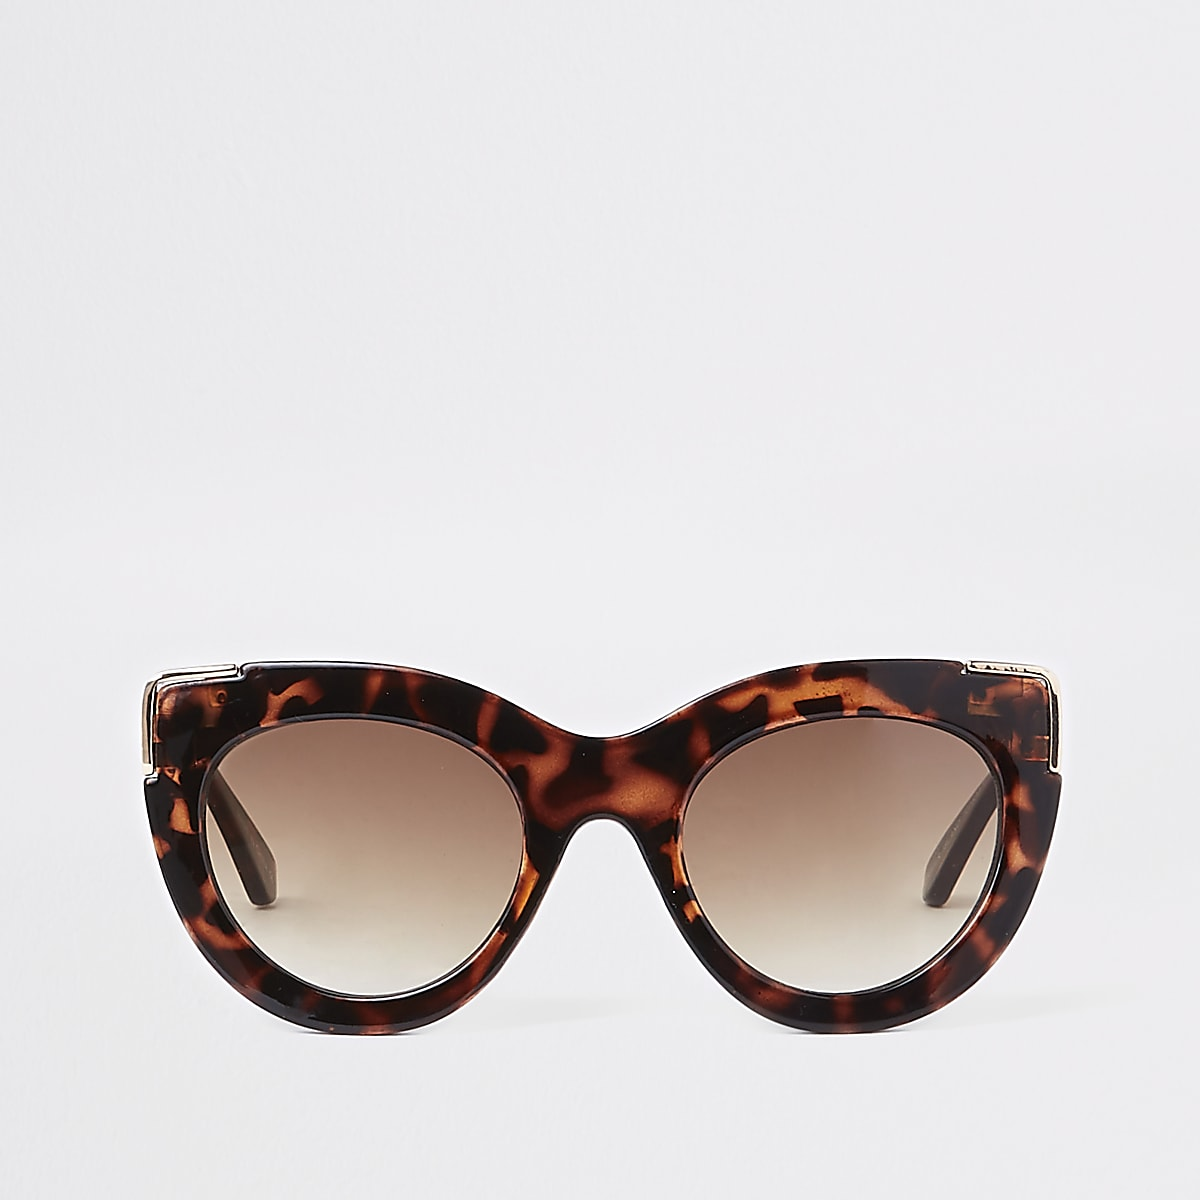 Brown tortoiseshell gold cat eye sunglasses